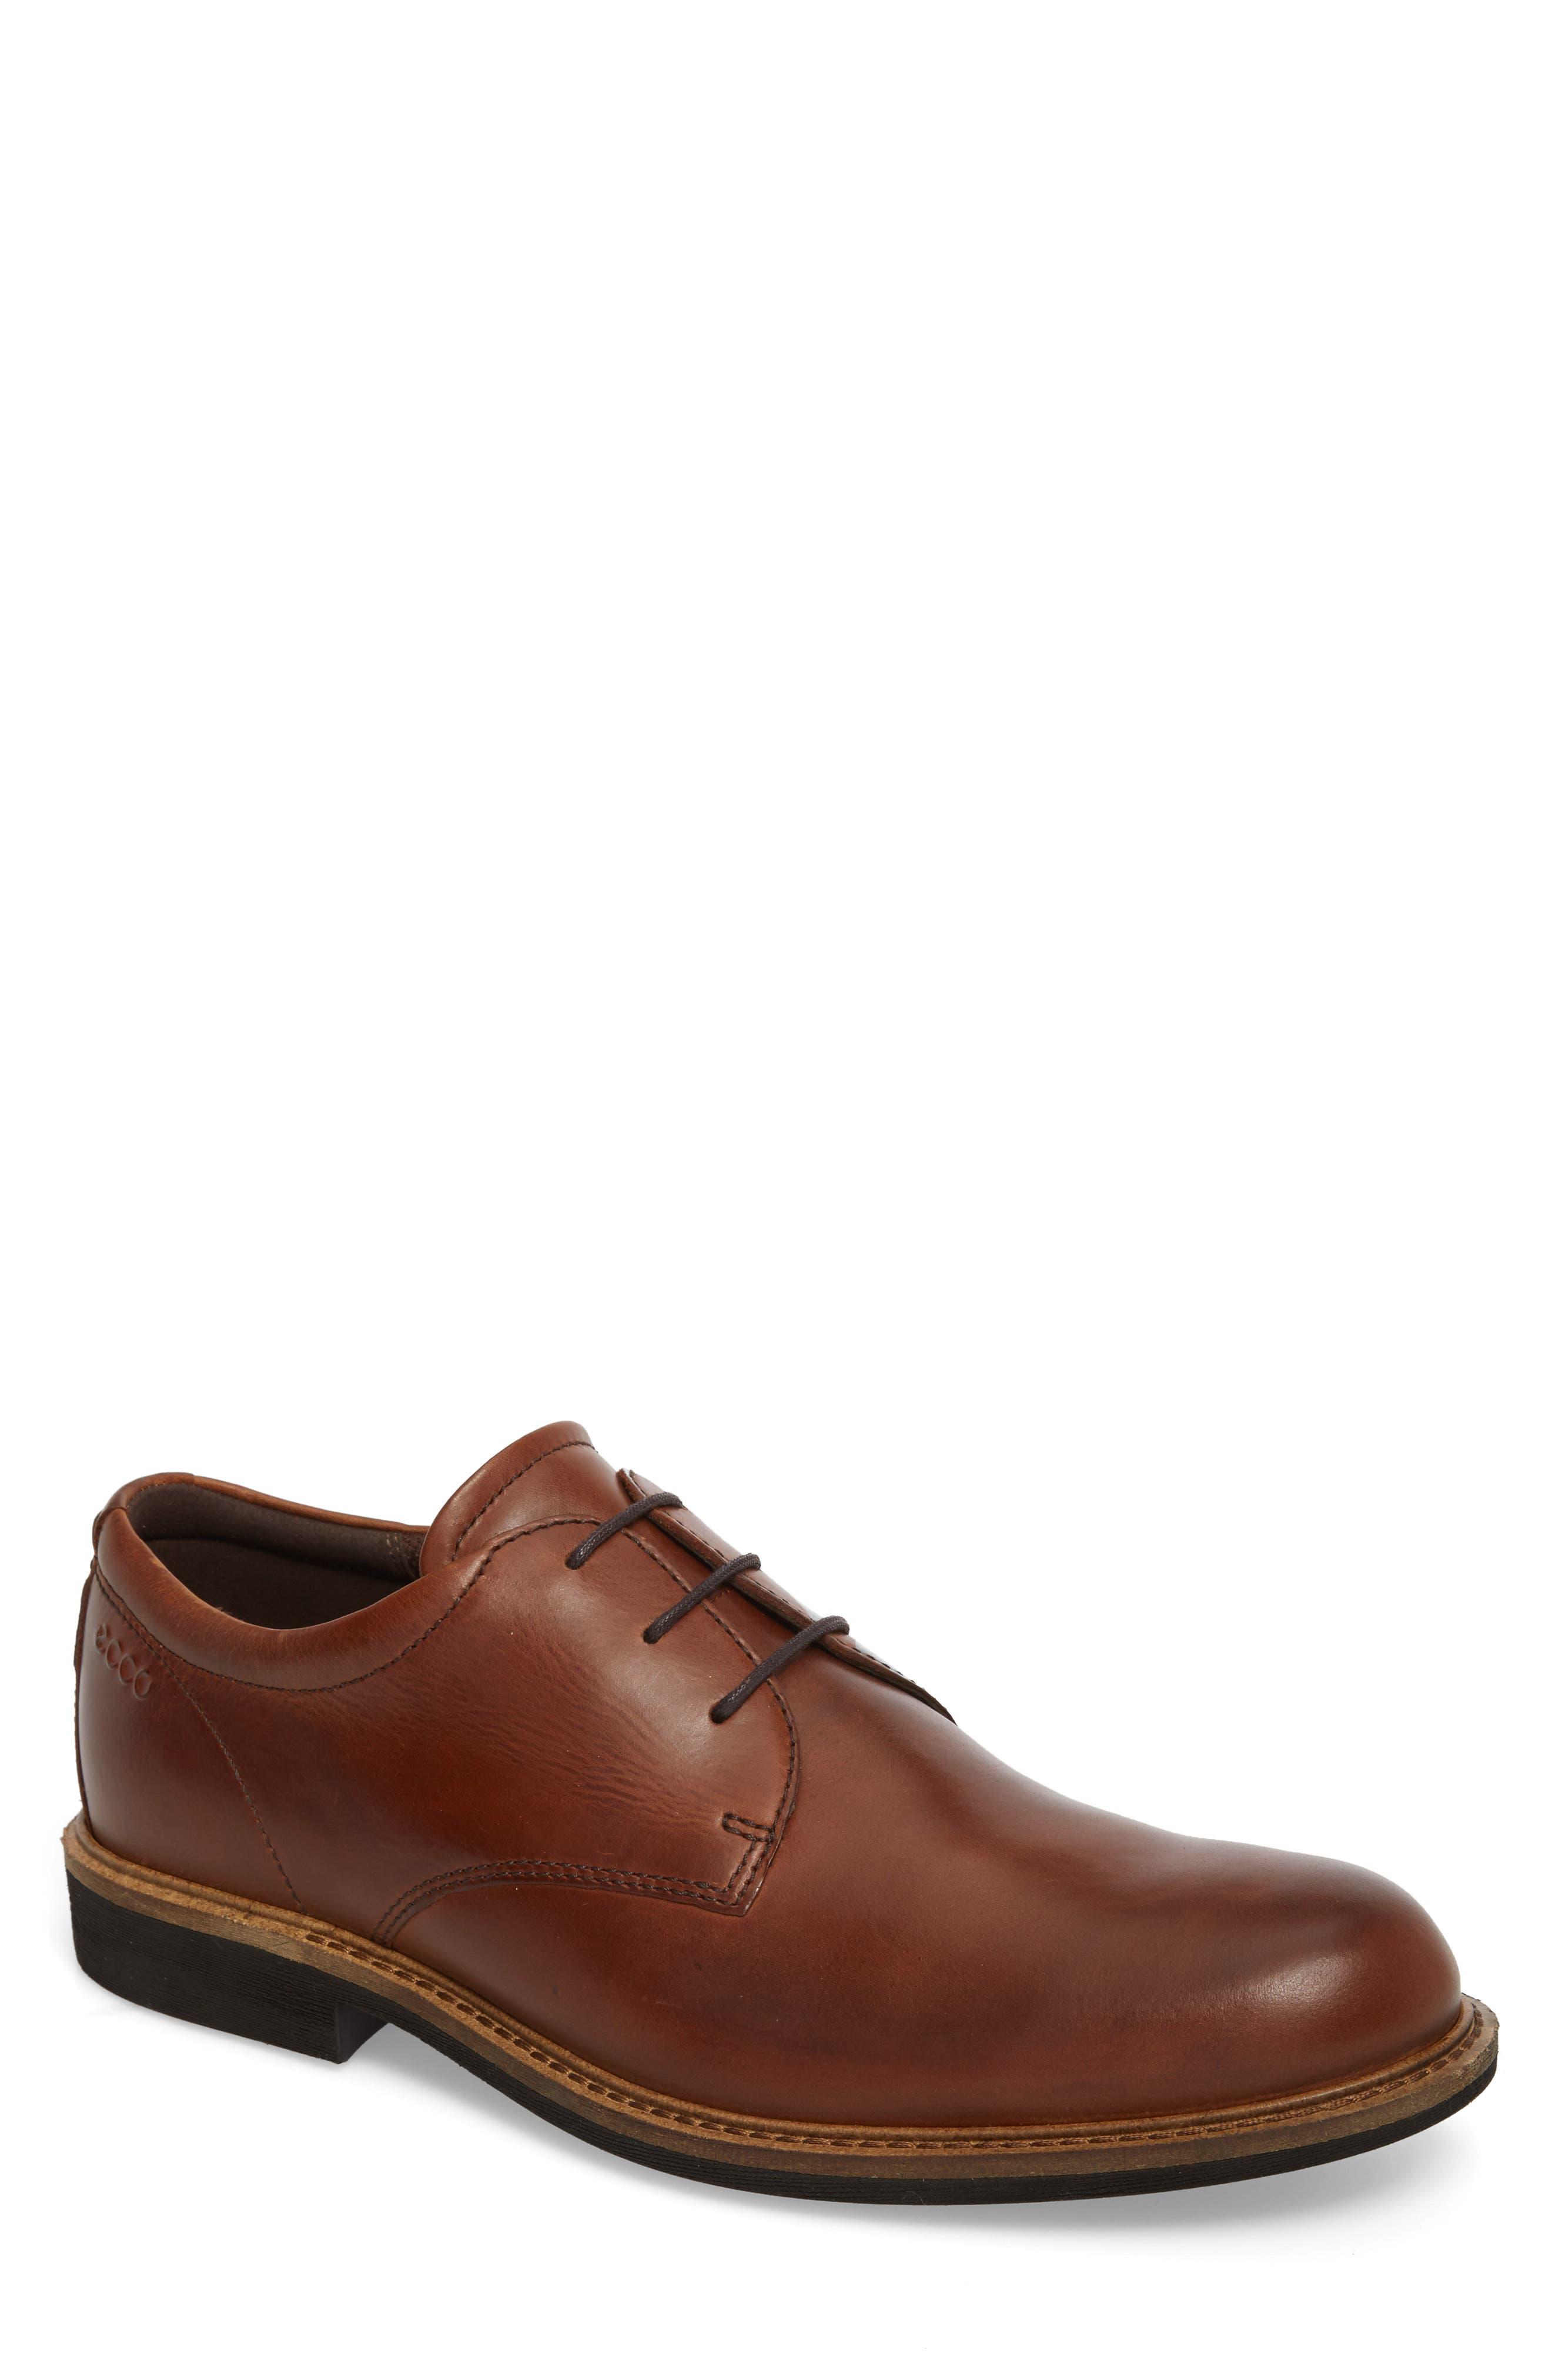 Findlay Plain Toe Derby,                             Main thumbnail 1, color,                             Cognac Leather